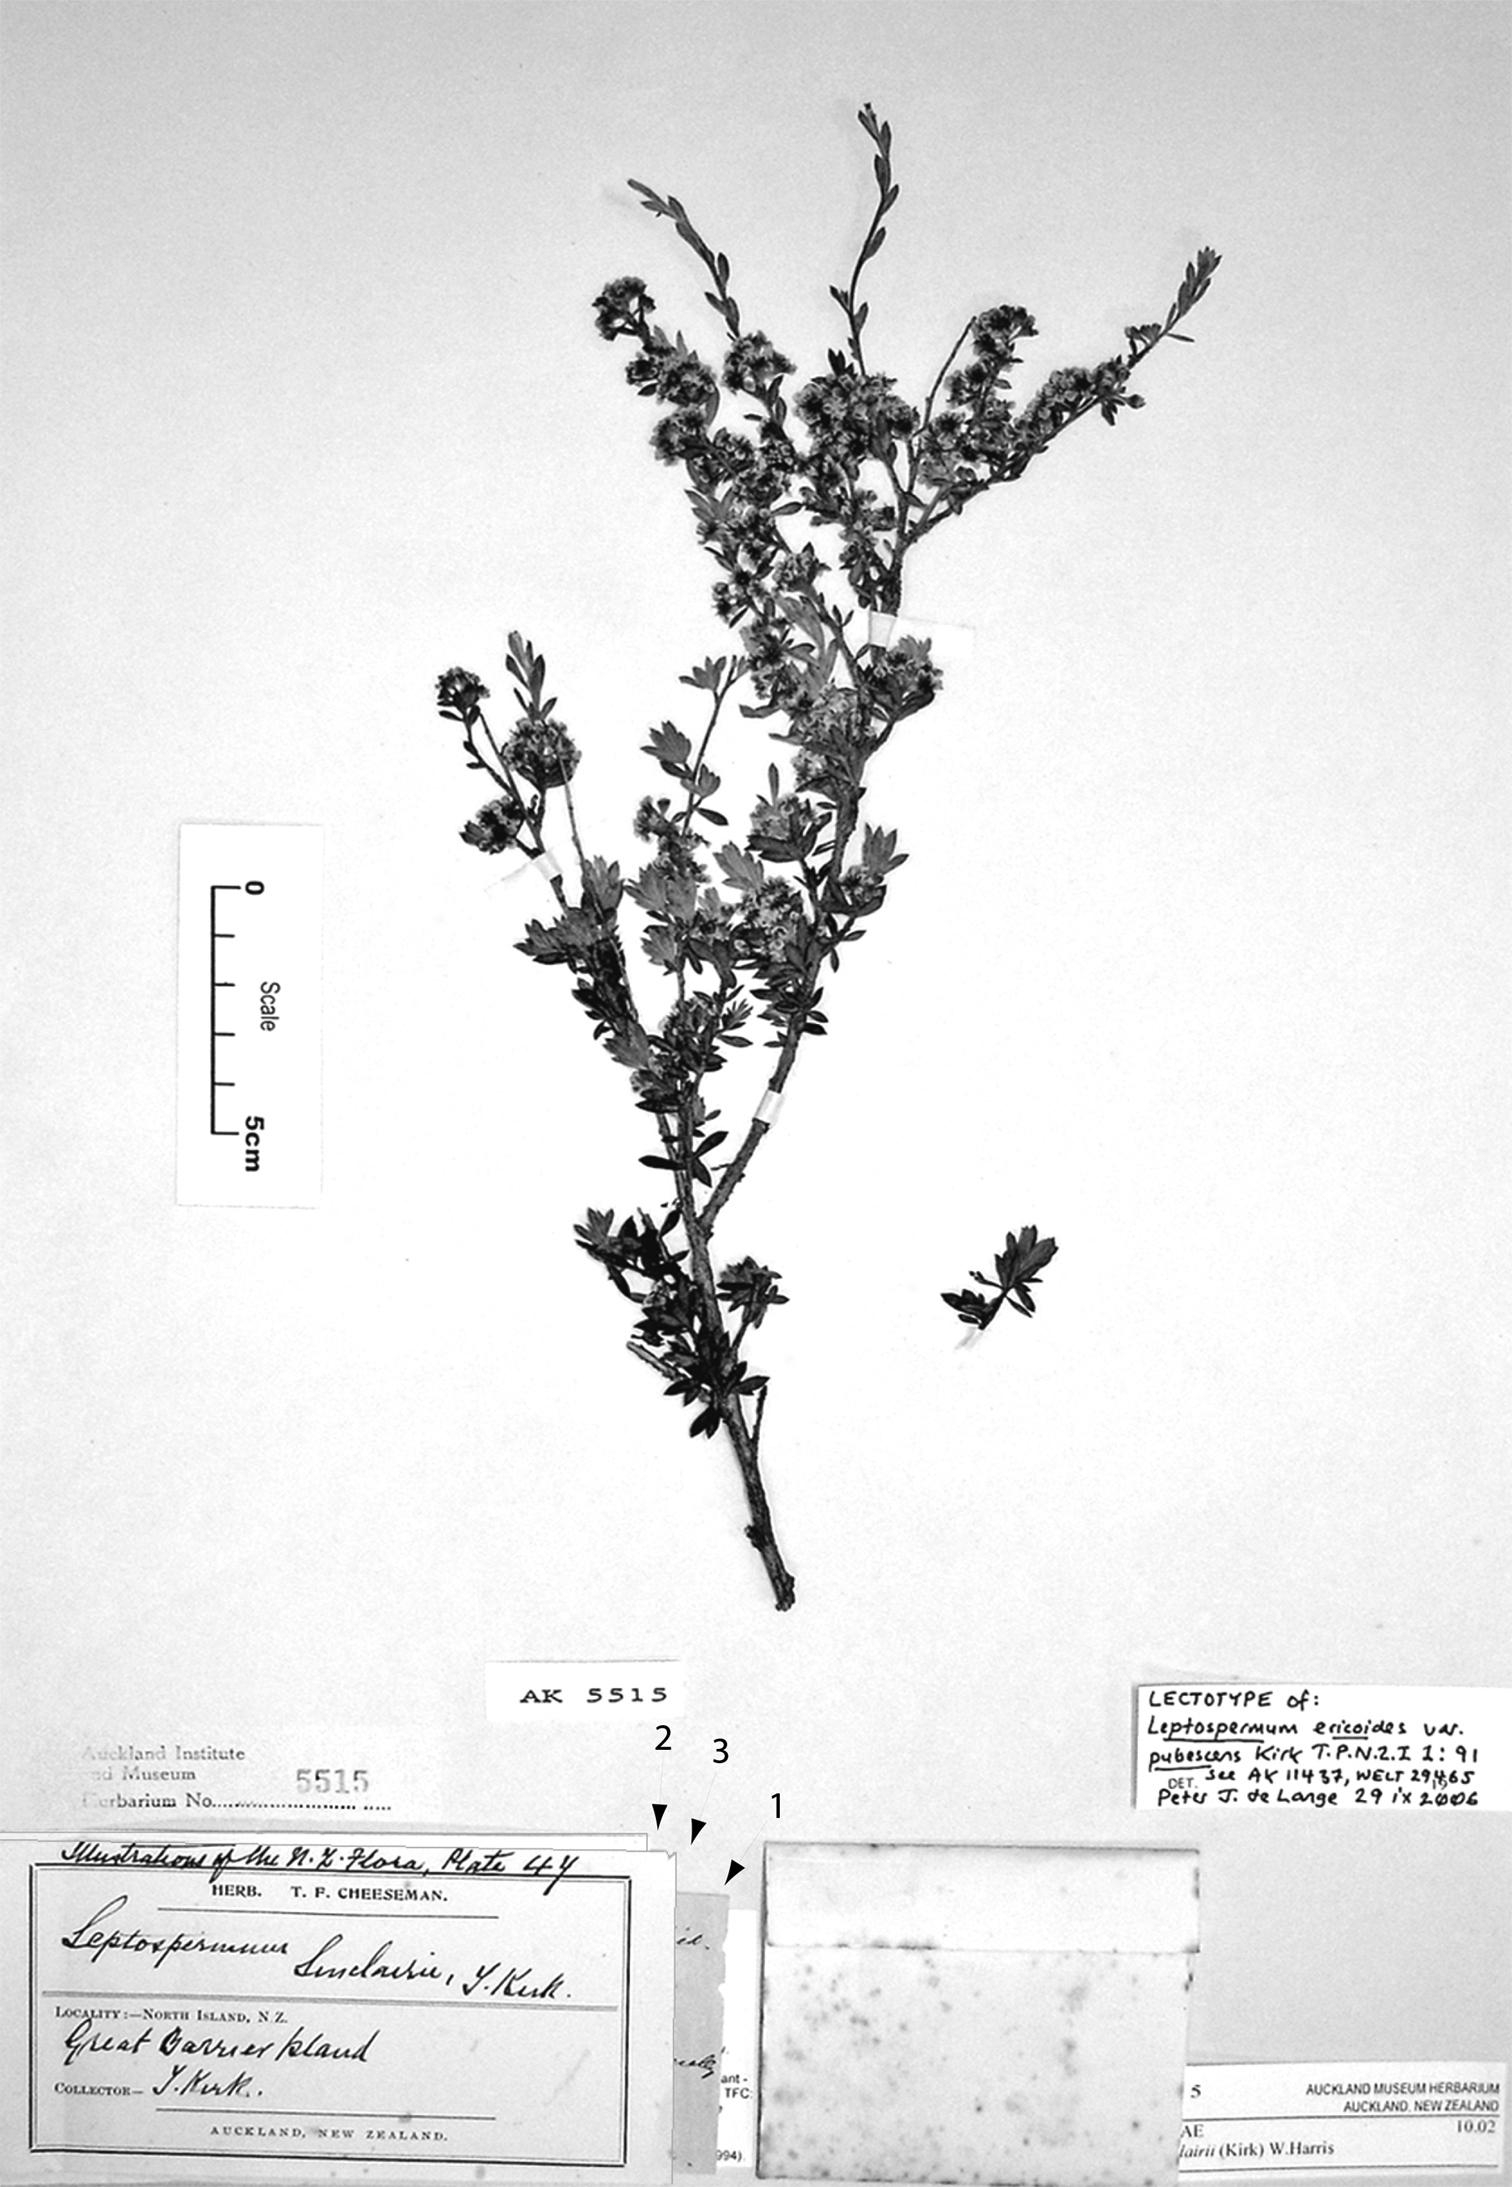 581.phytokeys 40 7973 sp 10 p 4